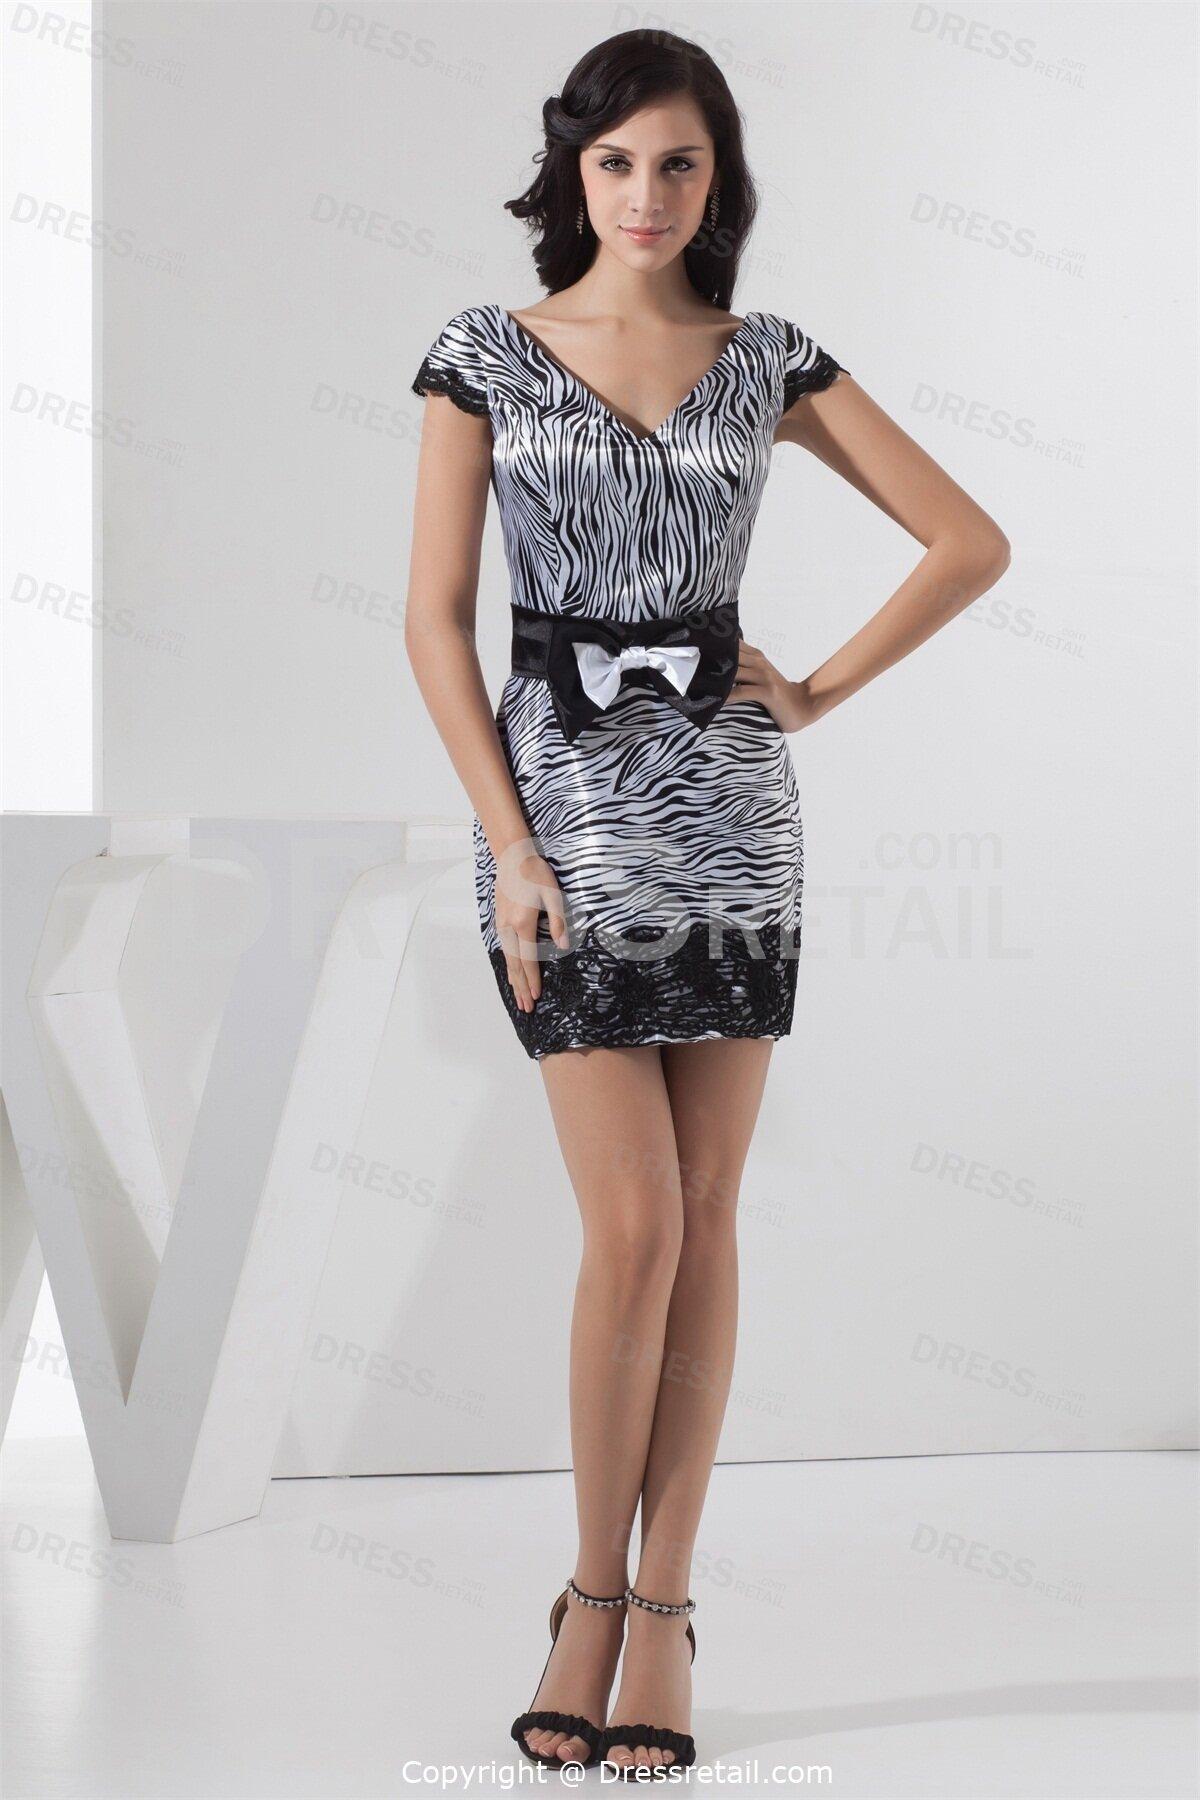 dresses for a wedding dress for a wedding black evening dresses for wedding guests